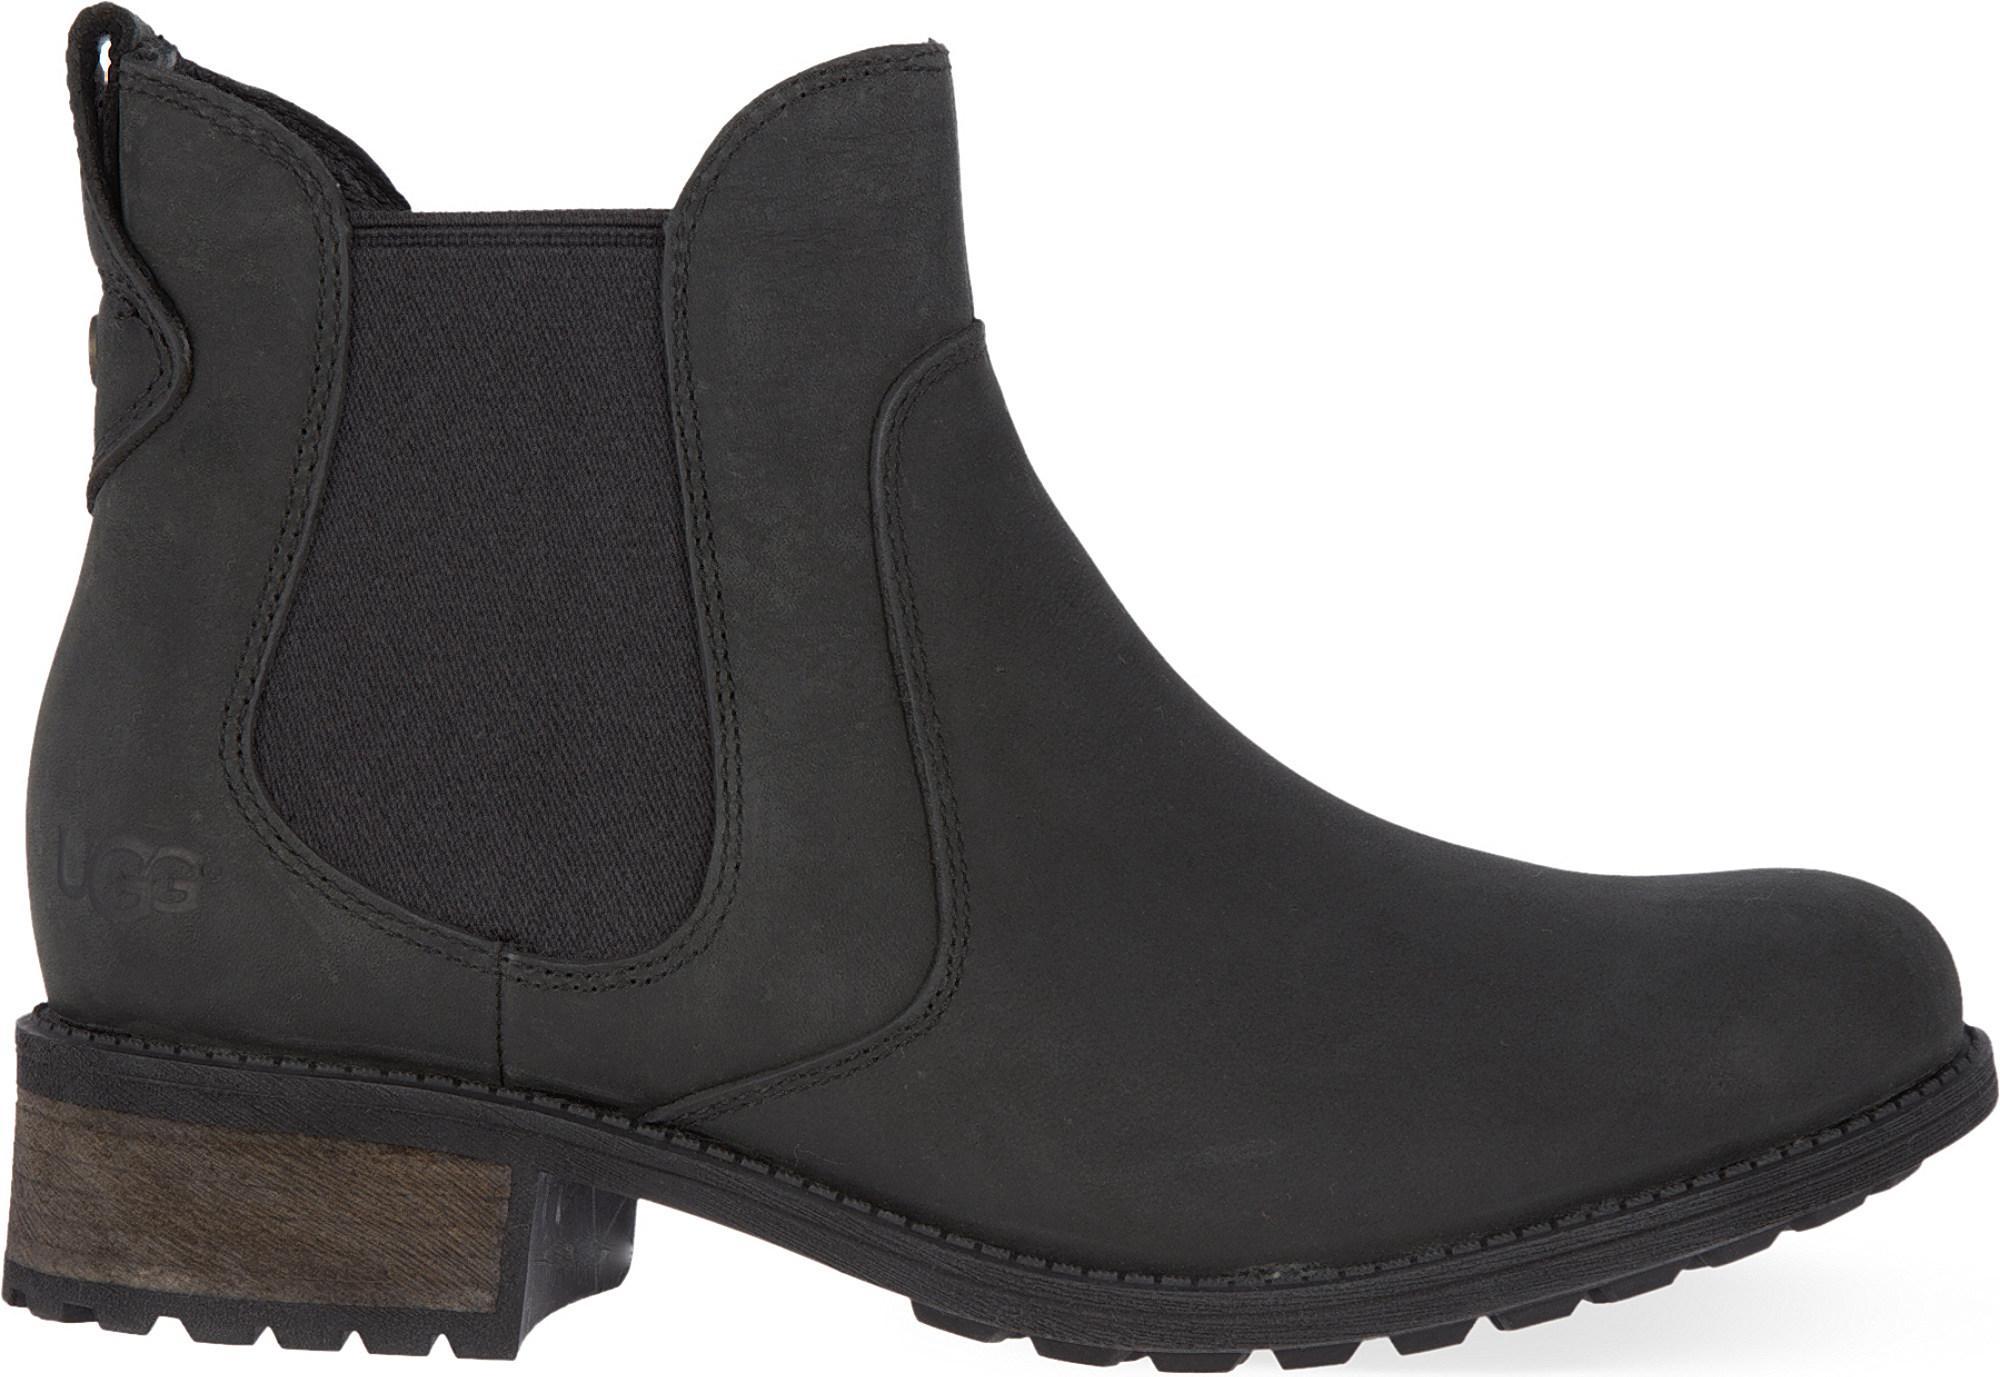 ugg boots selfridges uk